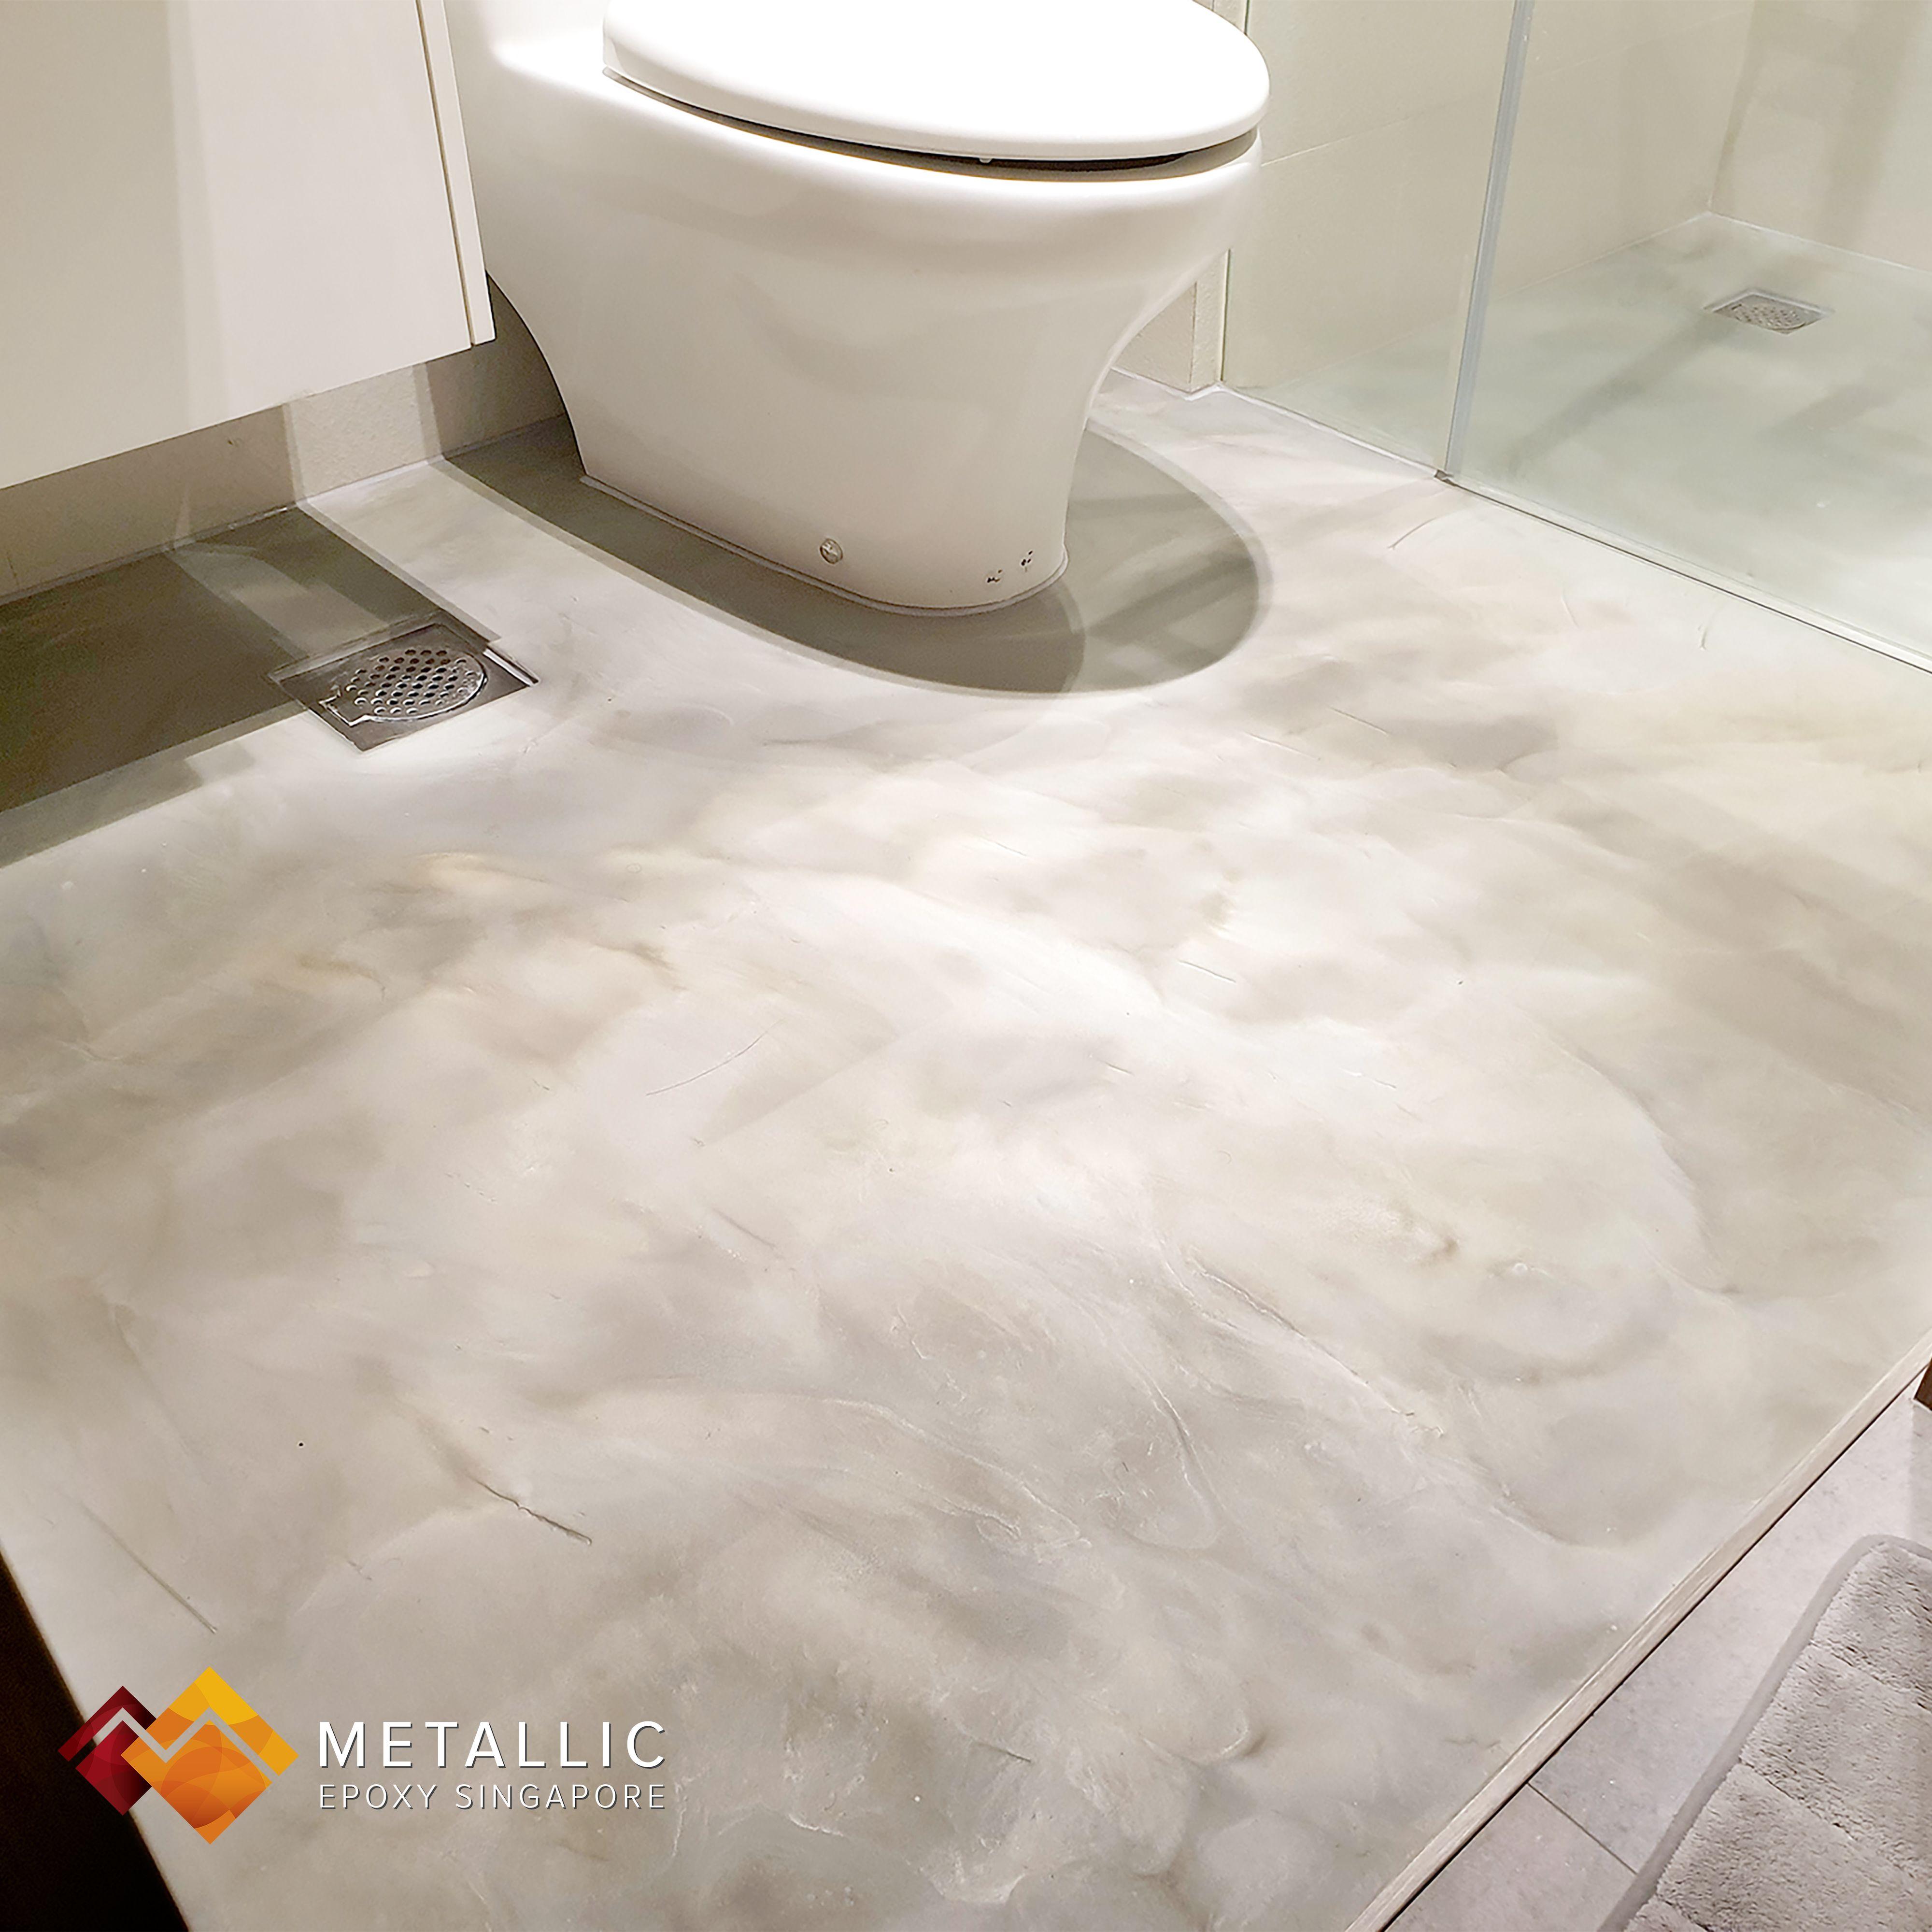 Industrial Concrete Bathroom Floor Theme Concrete Bathroom Bathroom Flooring Flooring